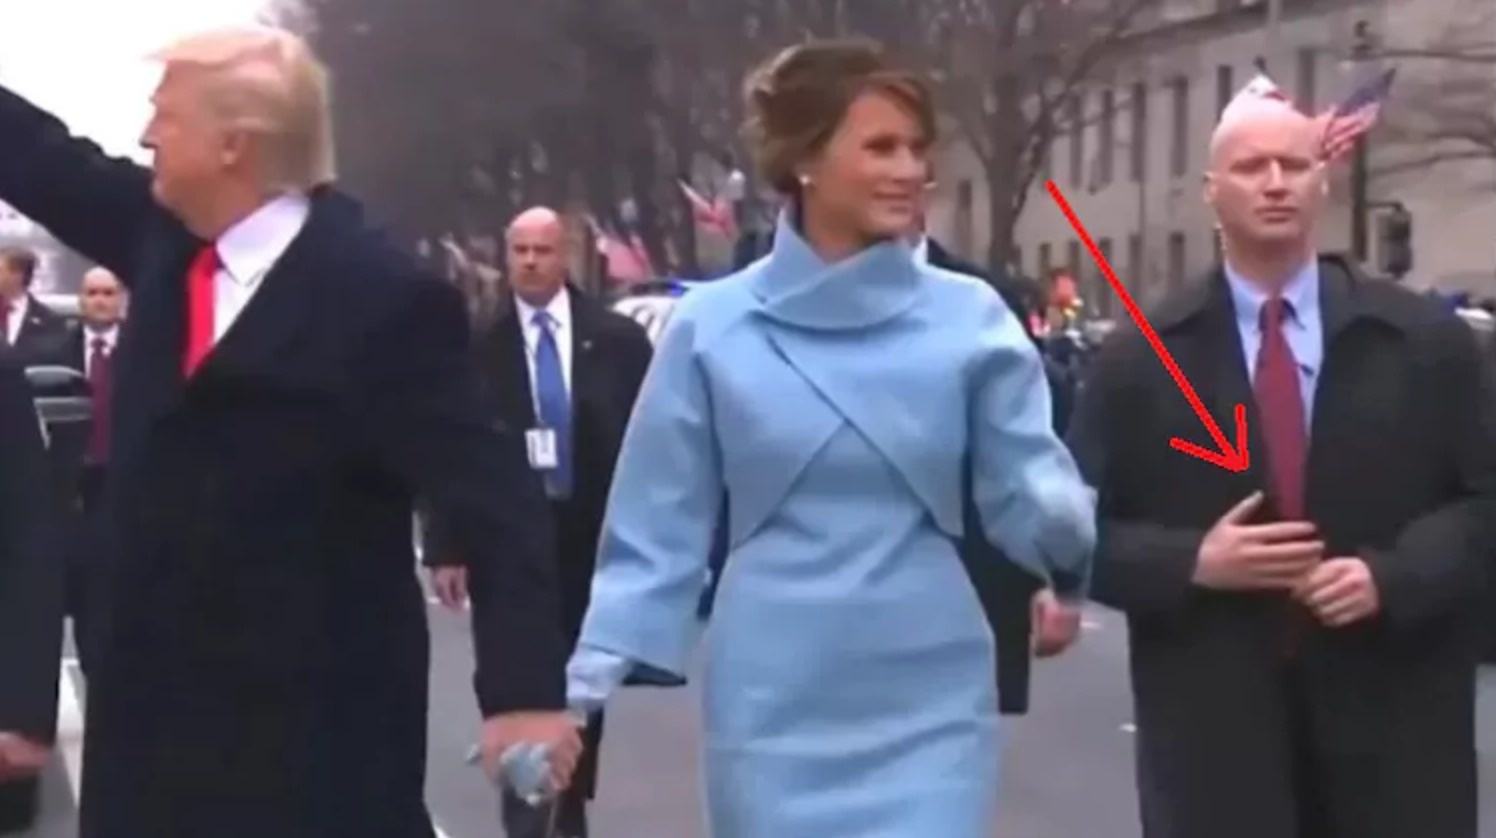 Agent Fake did president trump's secret service agent wear 'fake hands